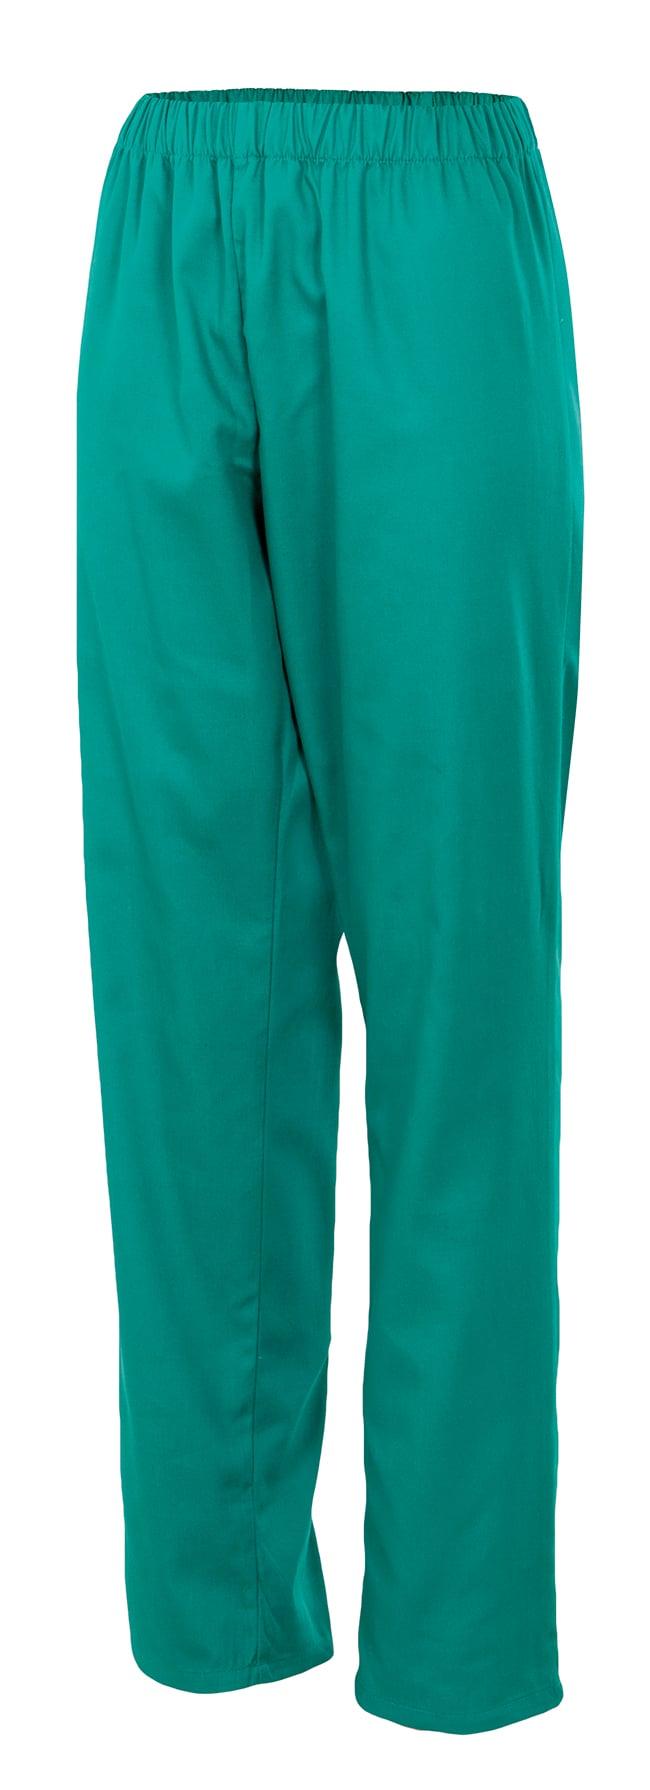 Velilla 333 PantalÓn Pijama Verde